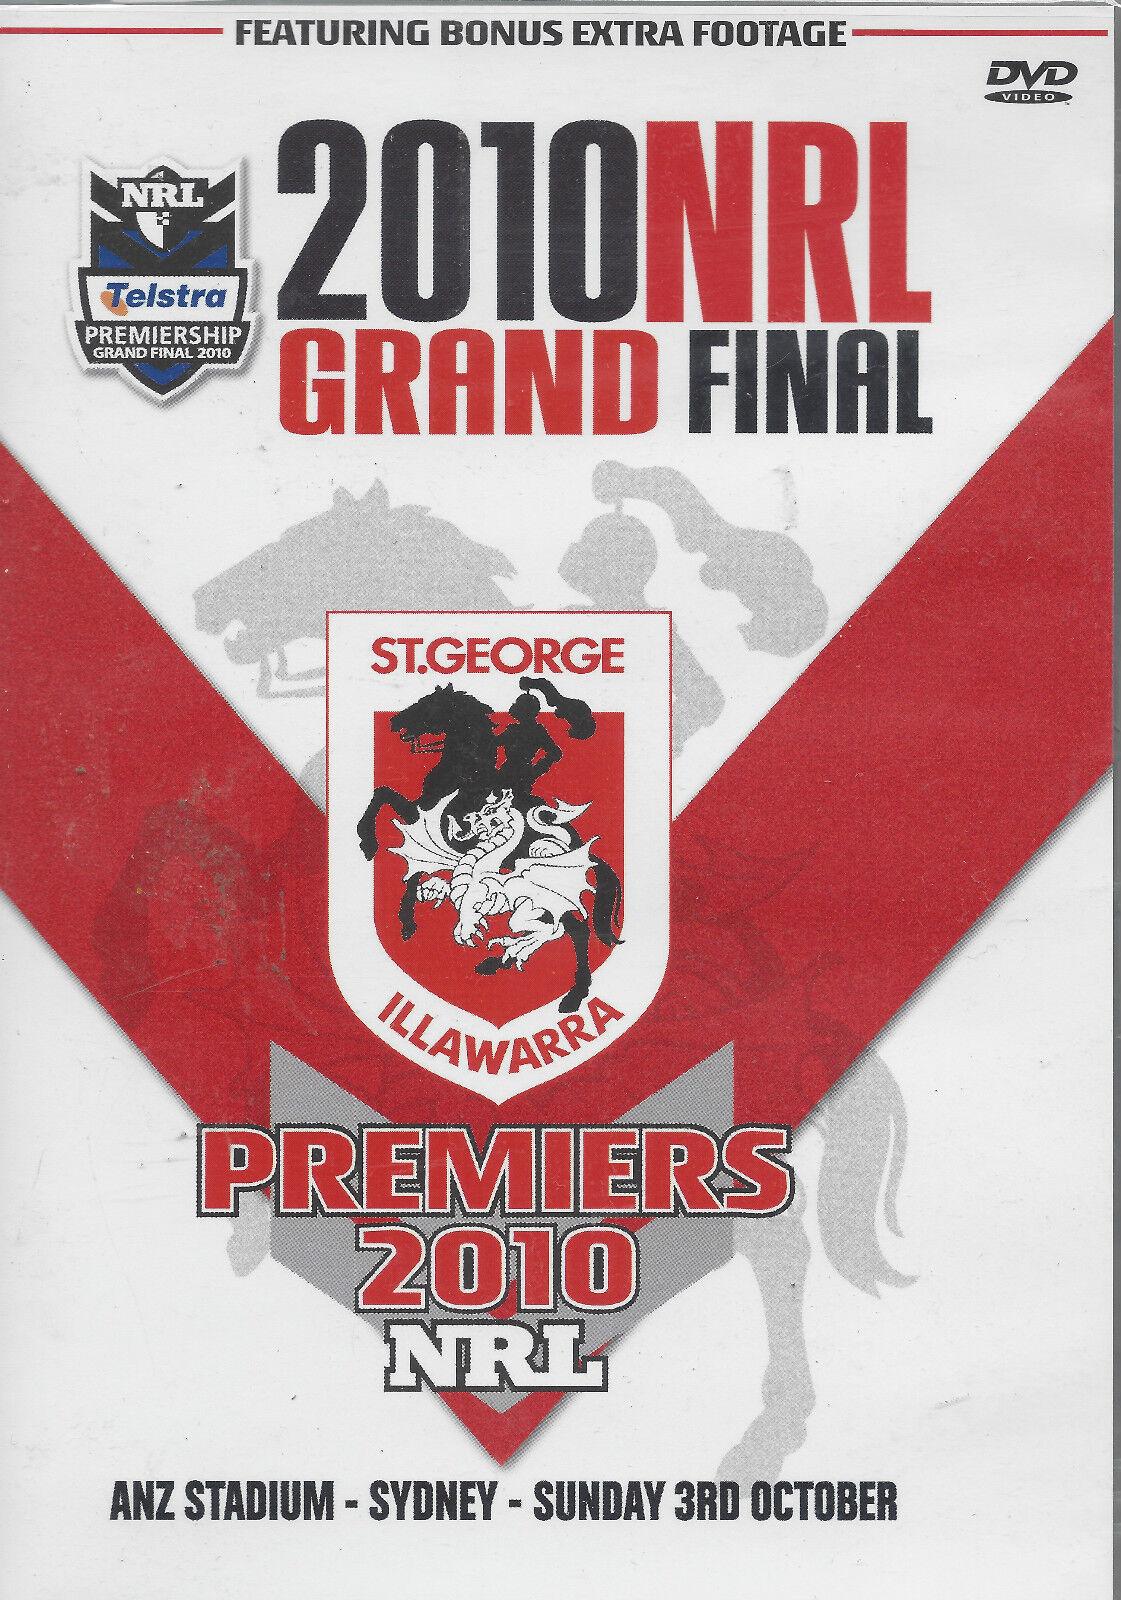 2010 NRL GRAND FINAL PREMIERS (DVD ...